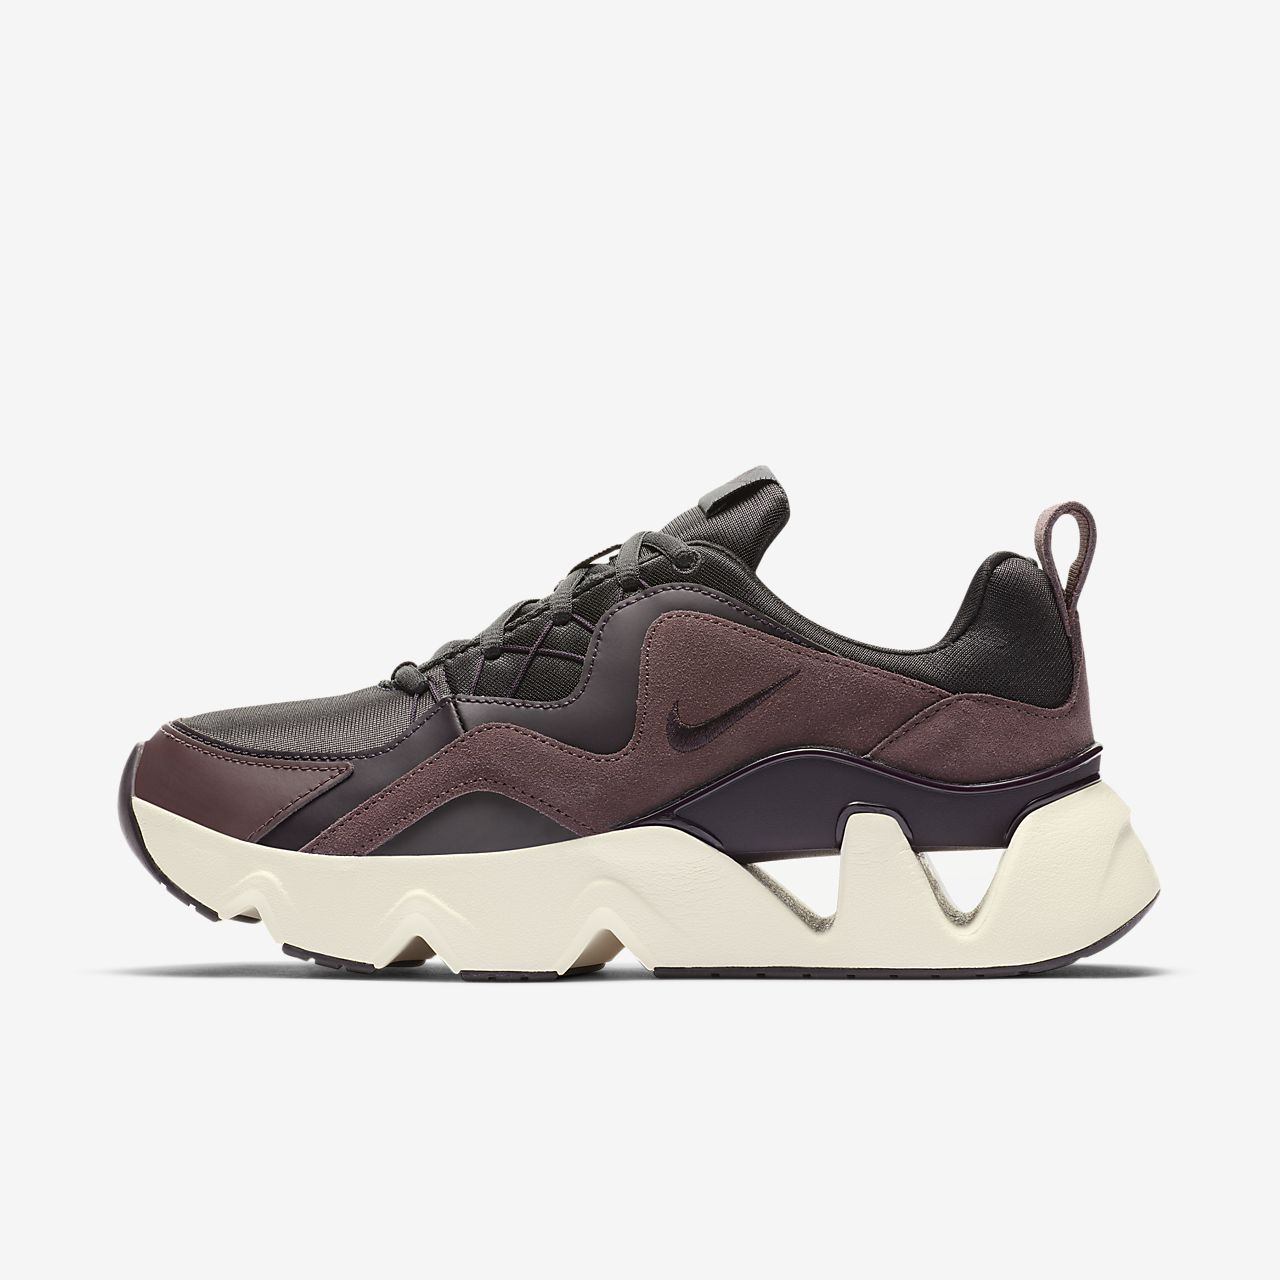 Dámská bota Nike RYZ 365